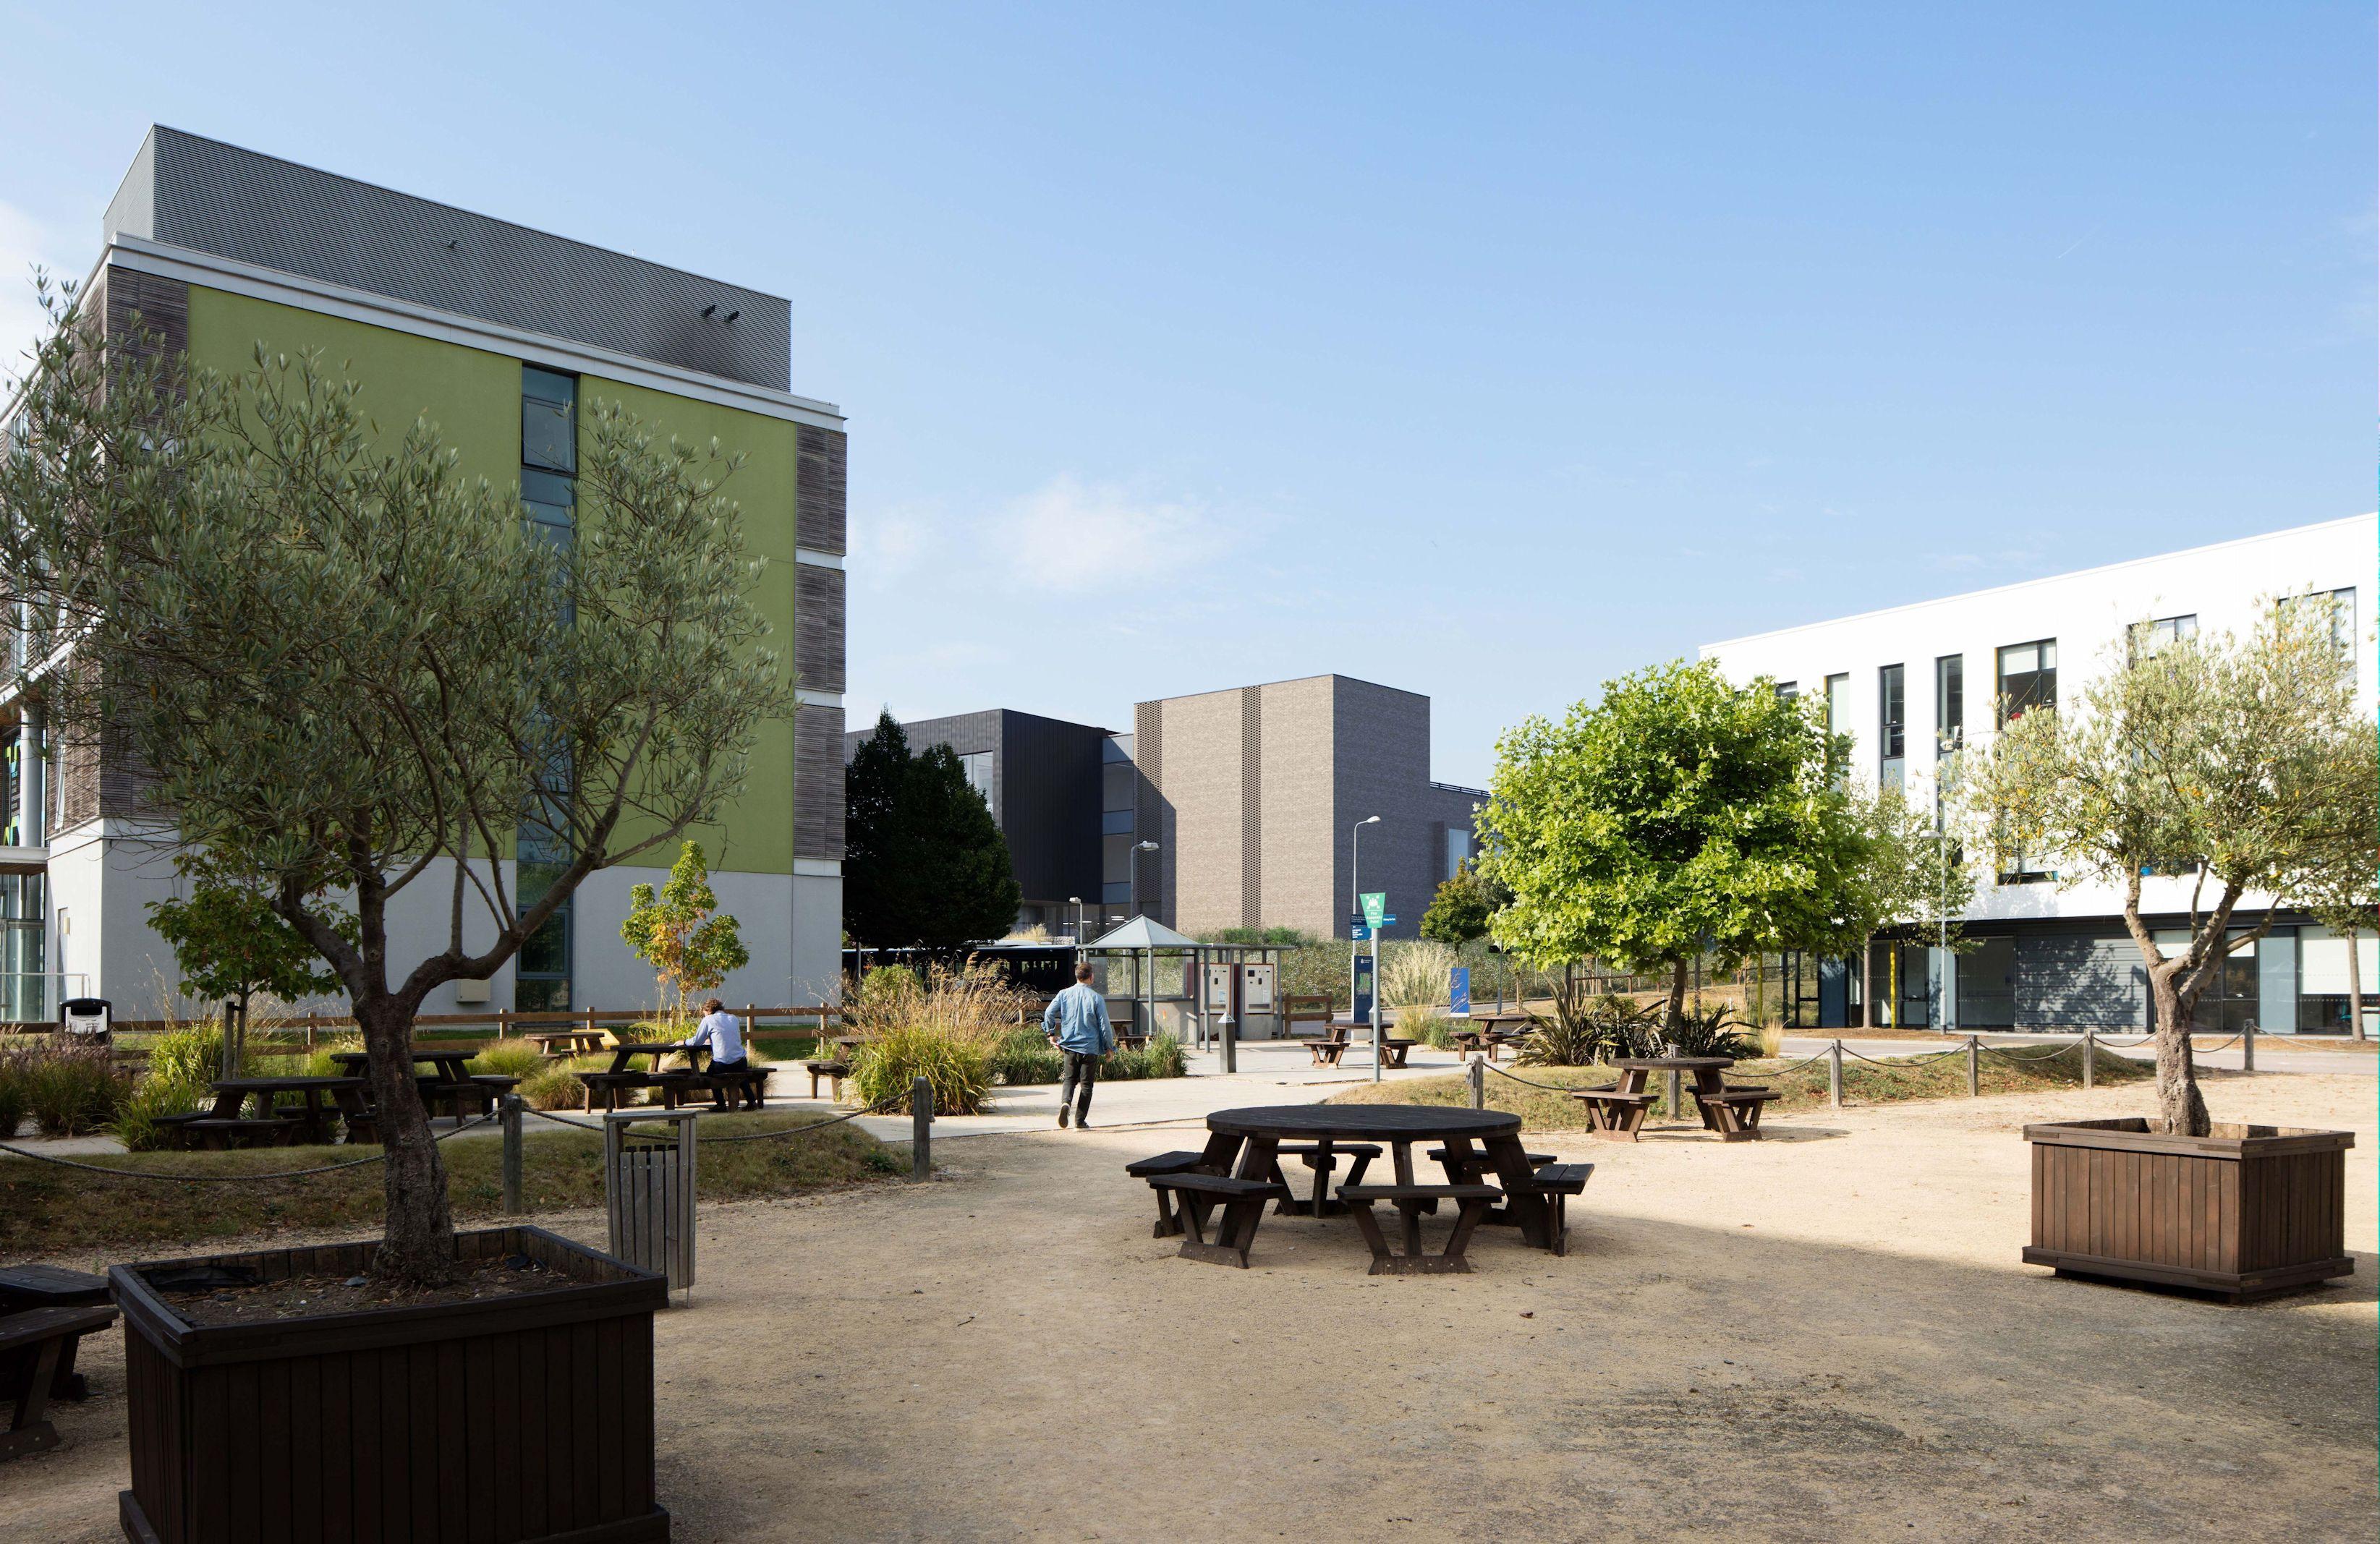 Anglia Ruskin School of medicine CGI midjpg